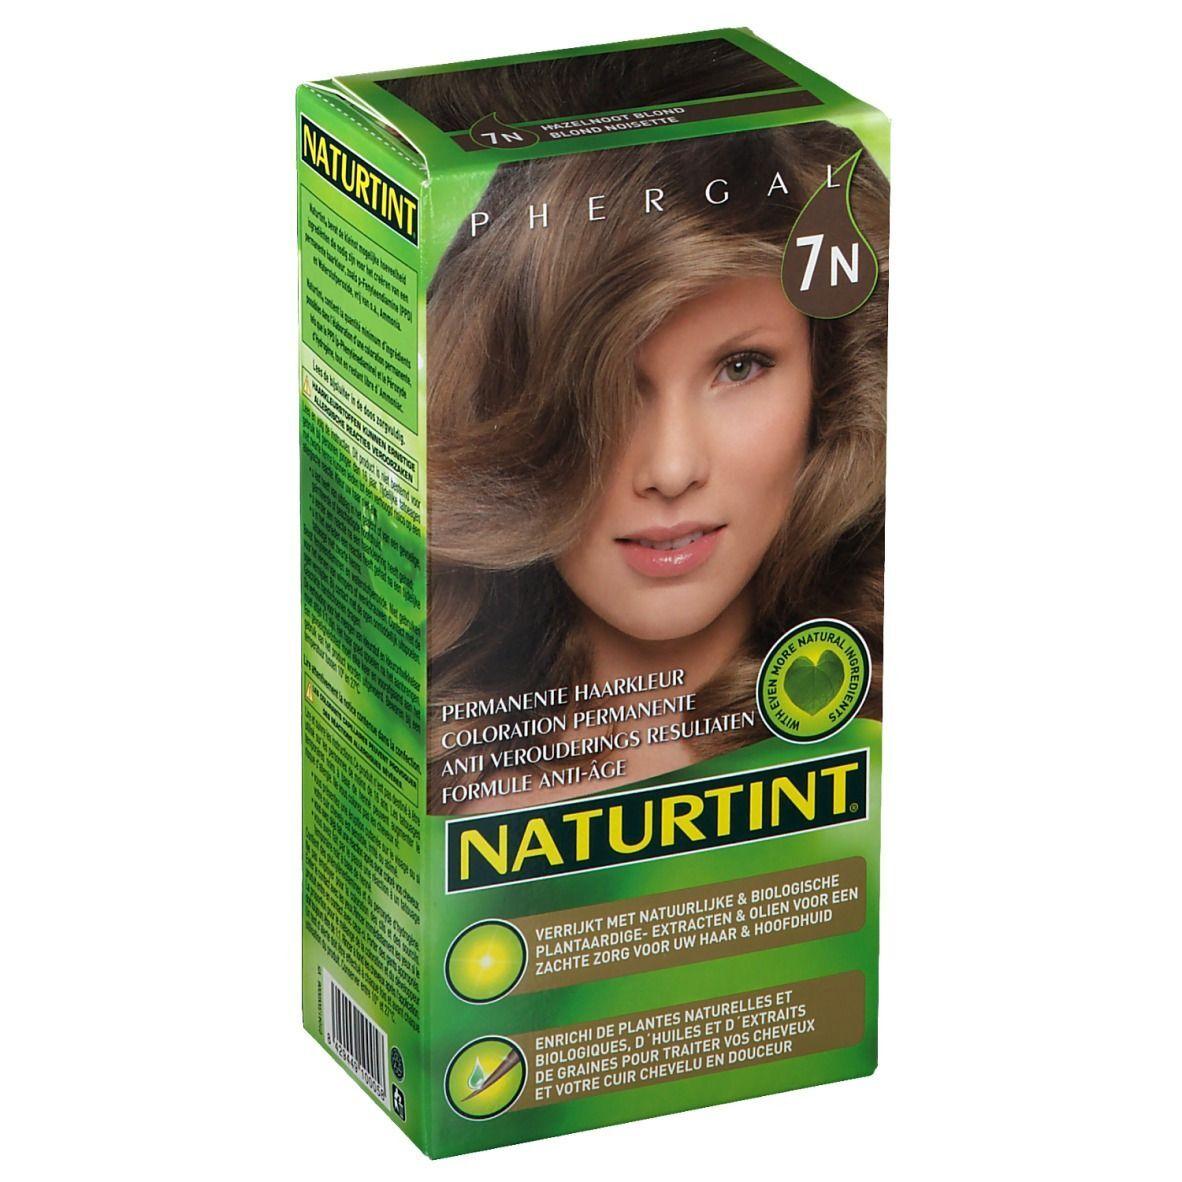 NATURTINT® Coloration Permanente 7N Blond noisette ml emballage(s) combi